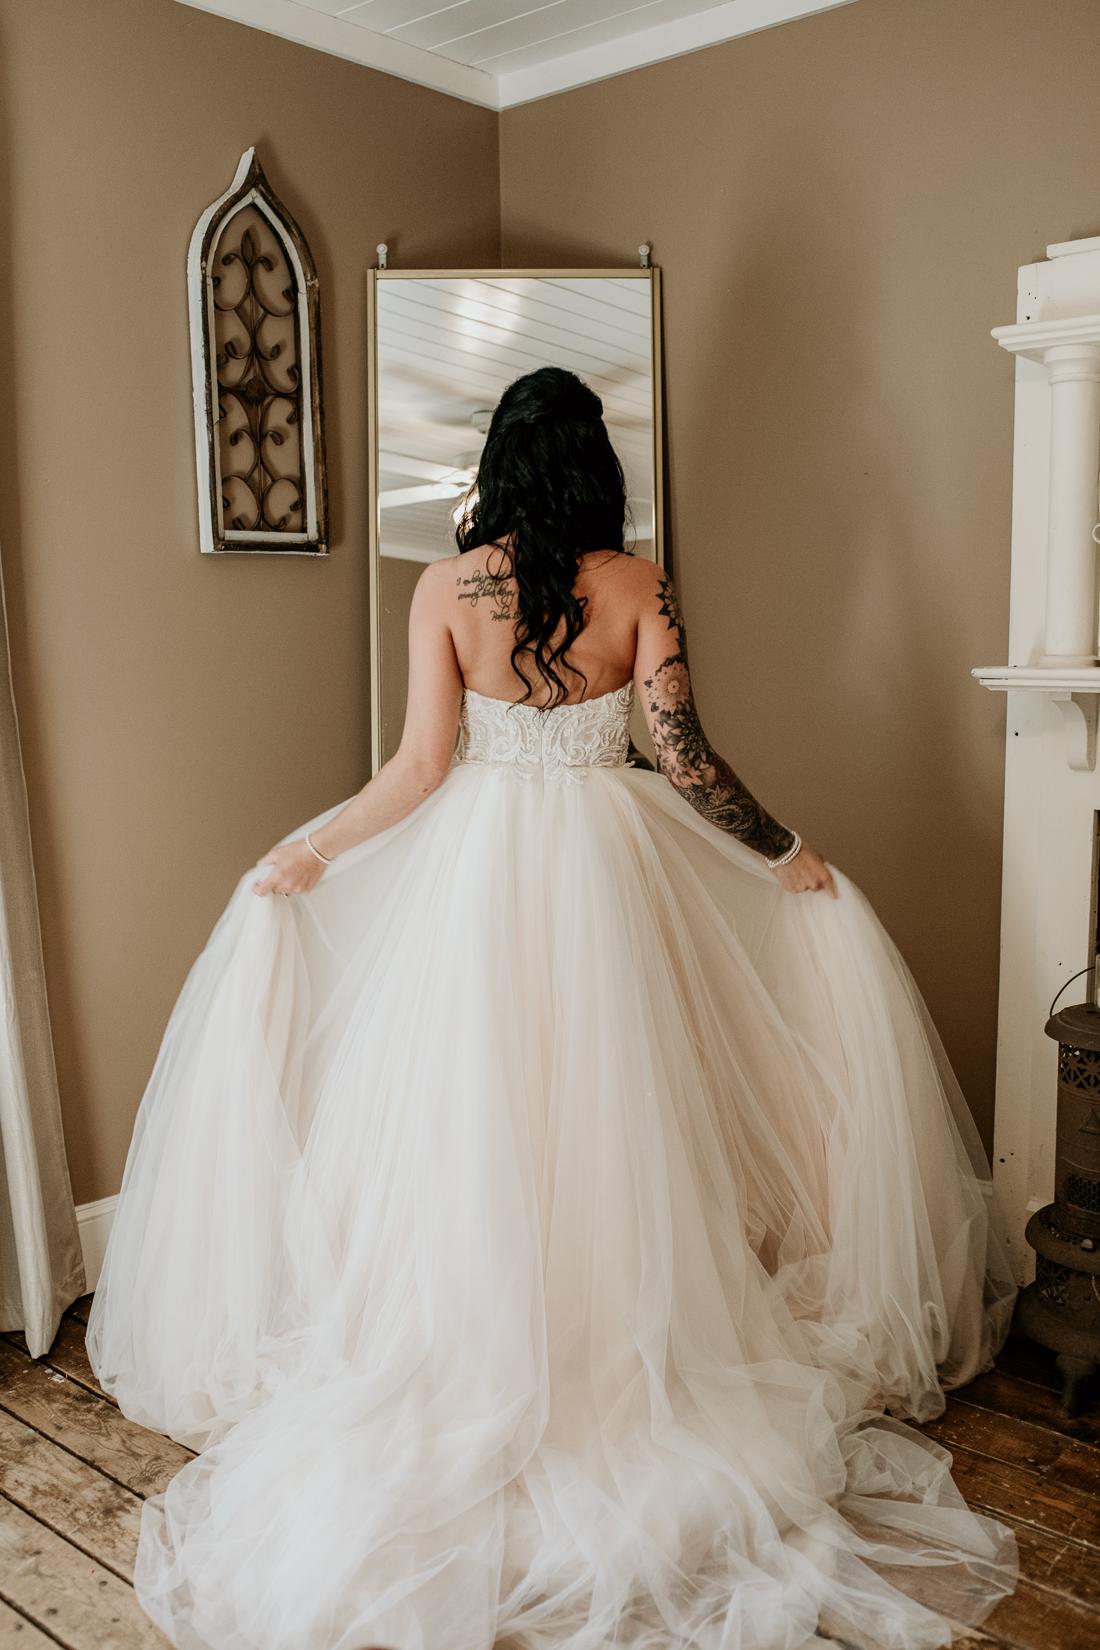 olivia_zay_wedding_09_2018-8674.jpg